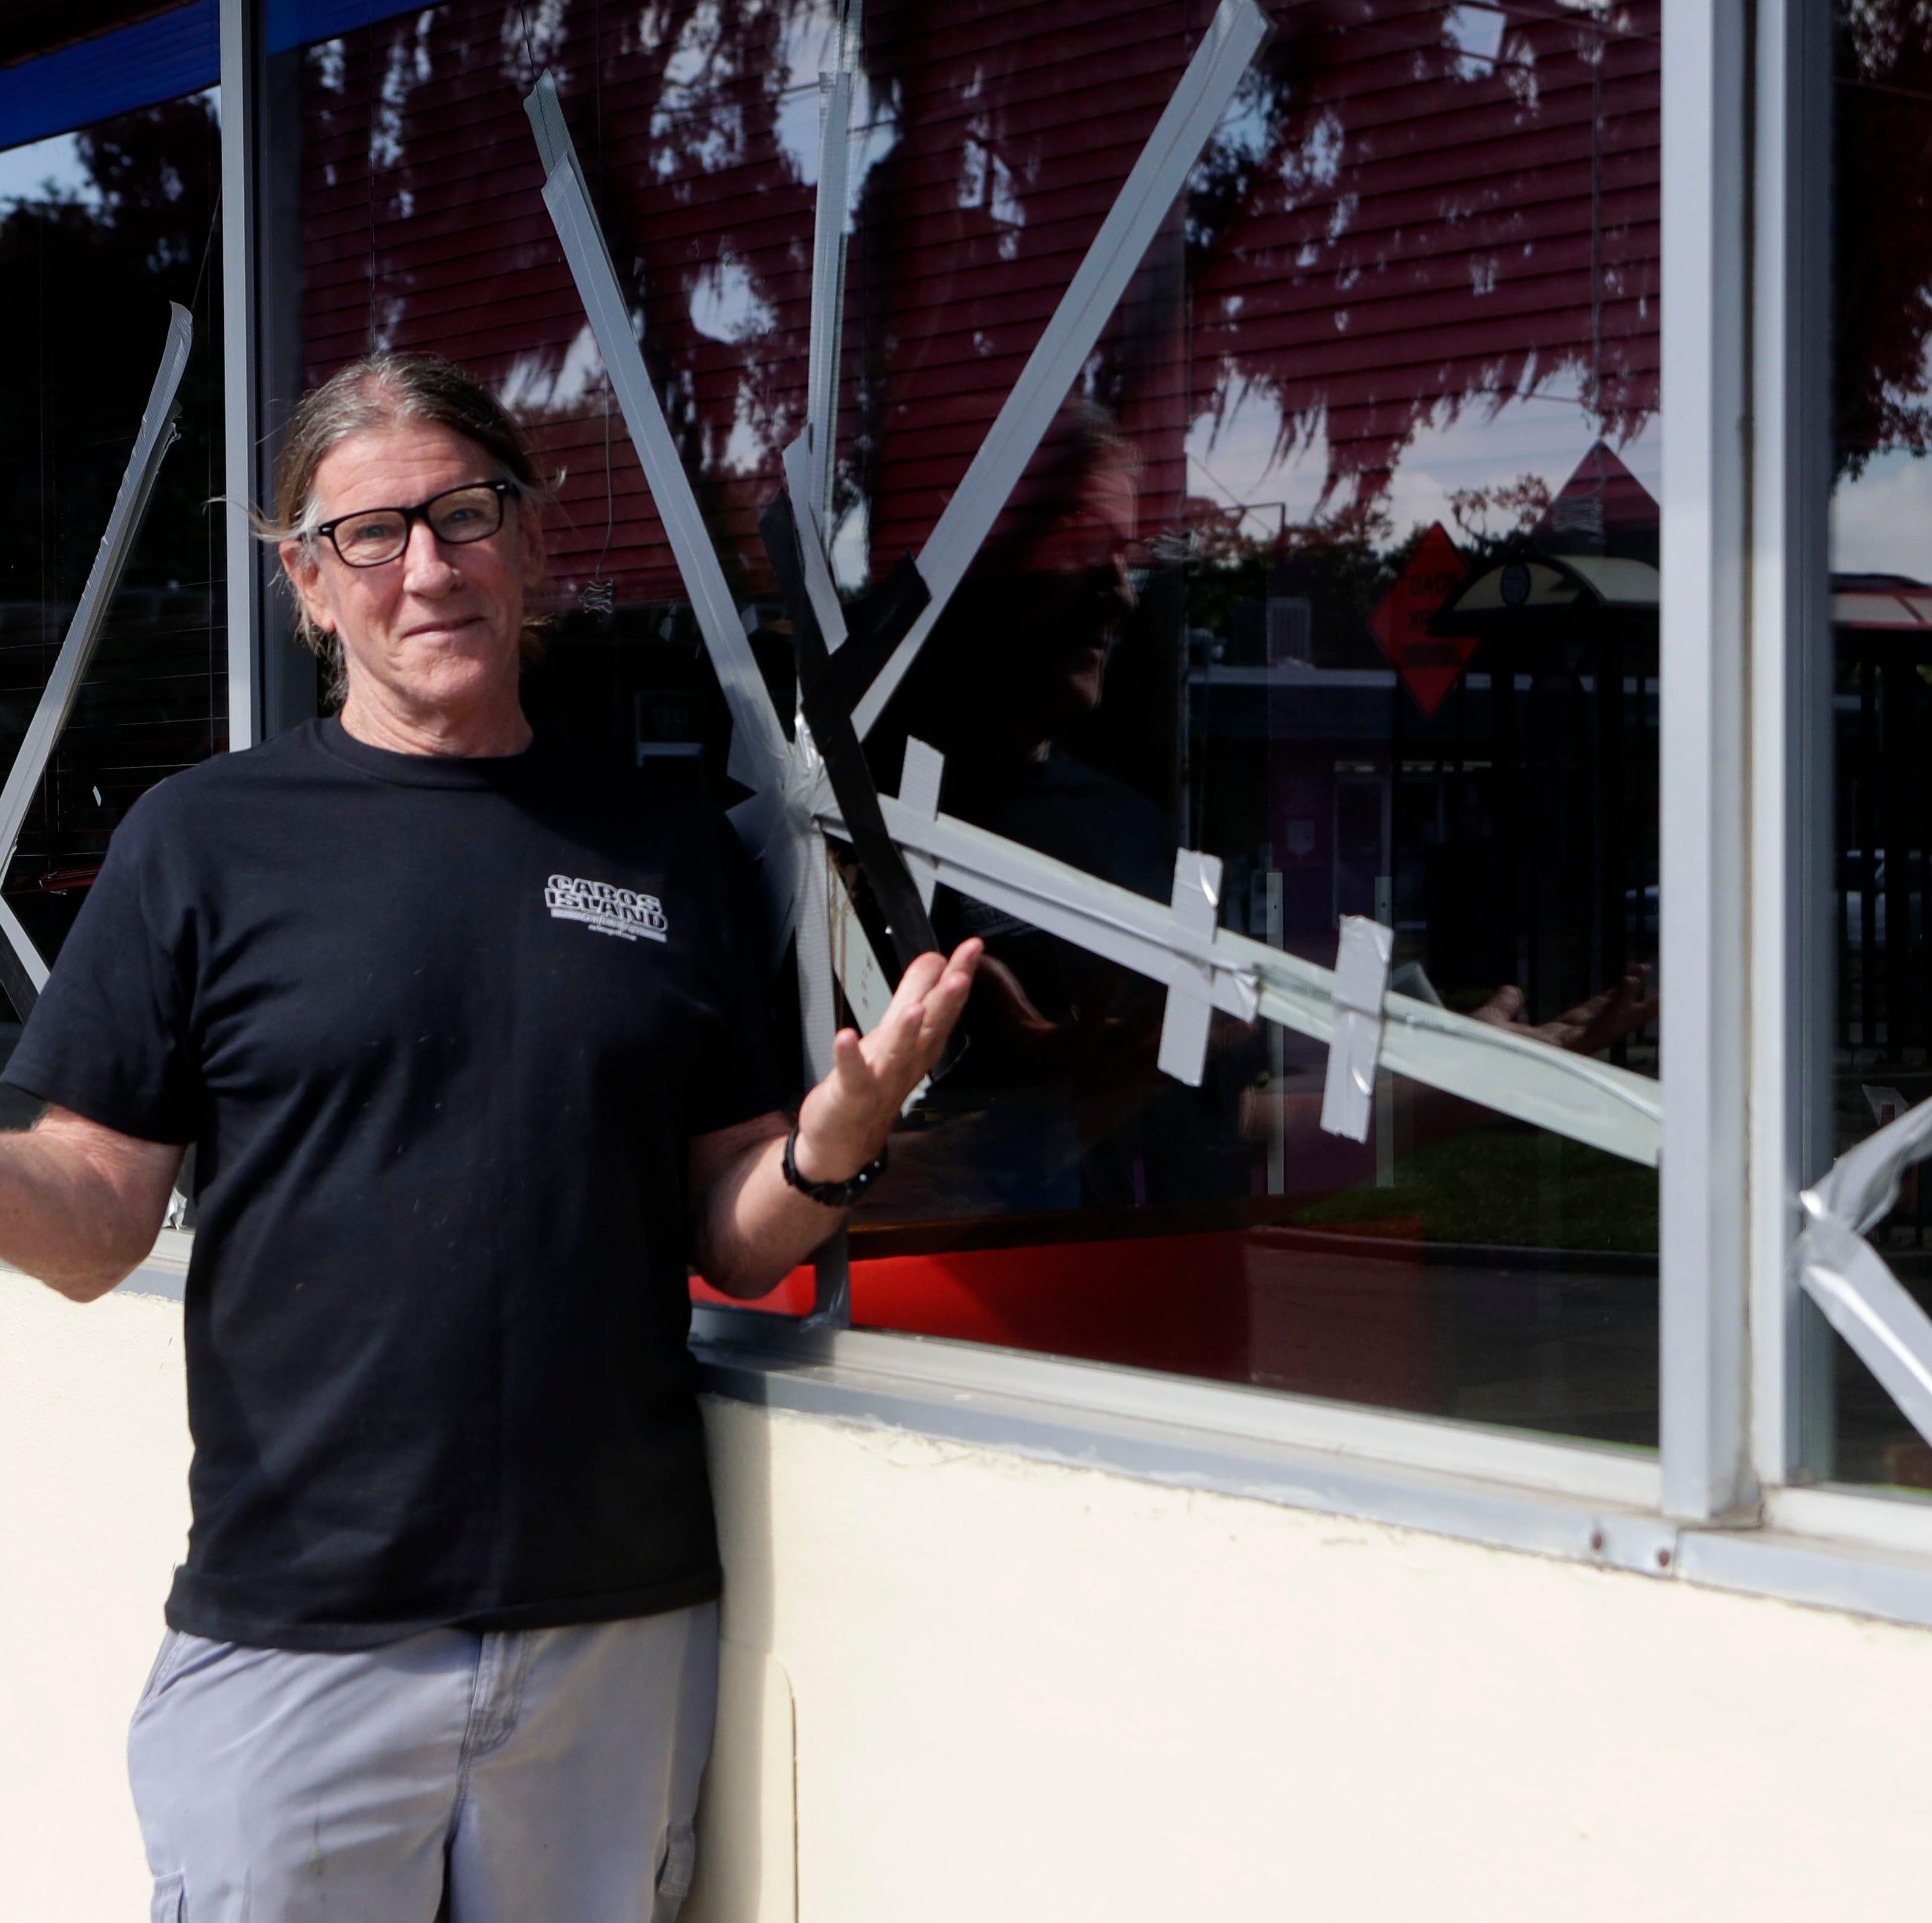 Man smashes windows at Cabo's restaurant, later apologizes